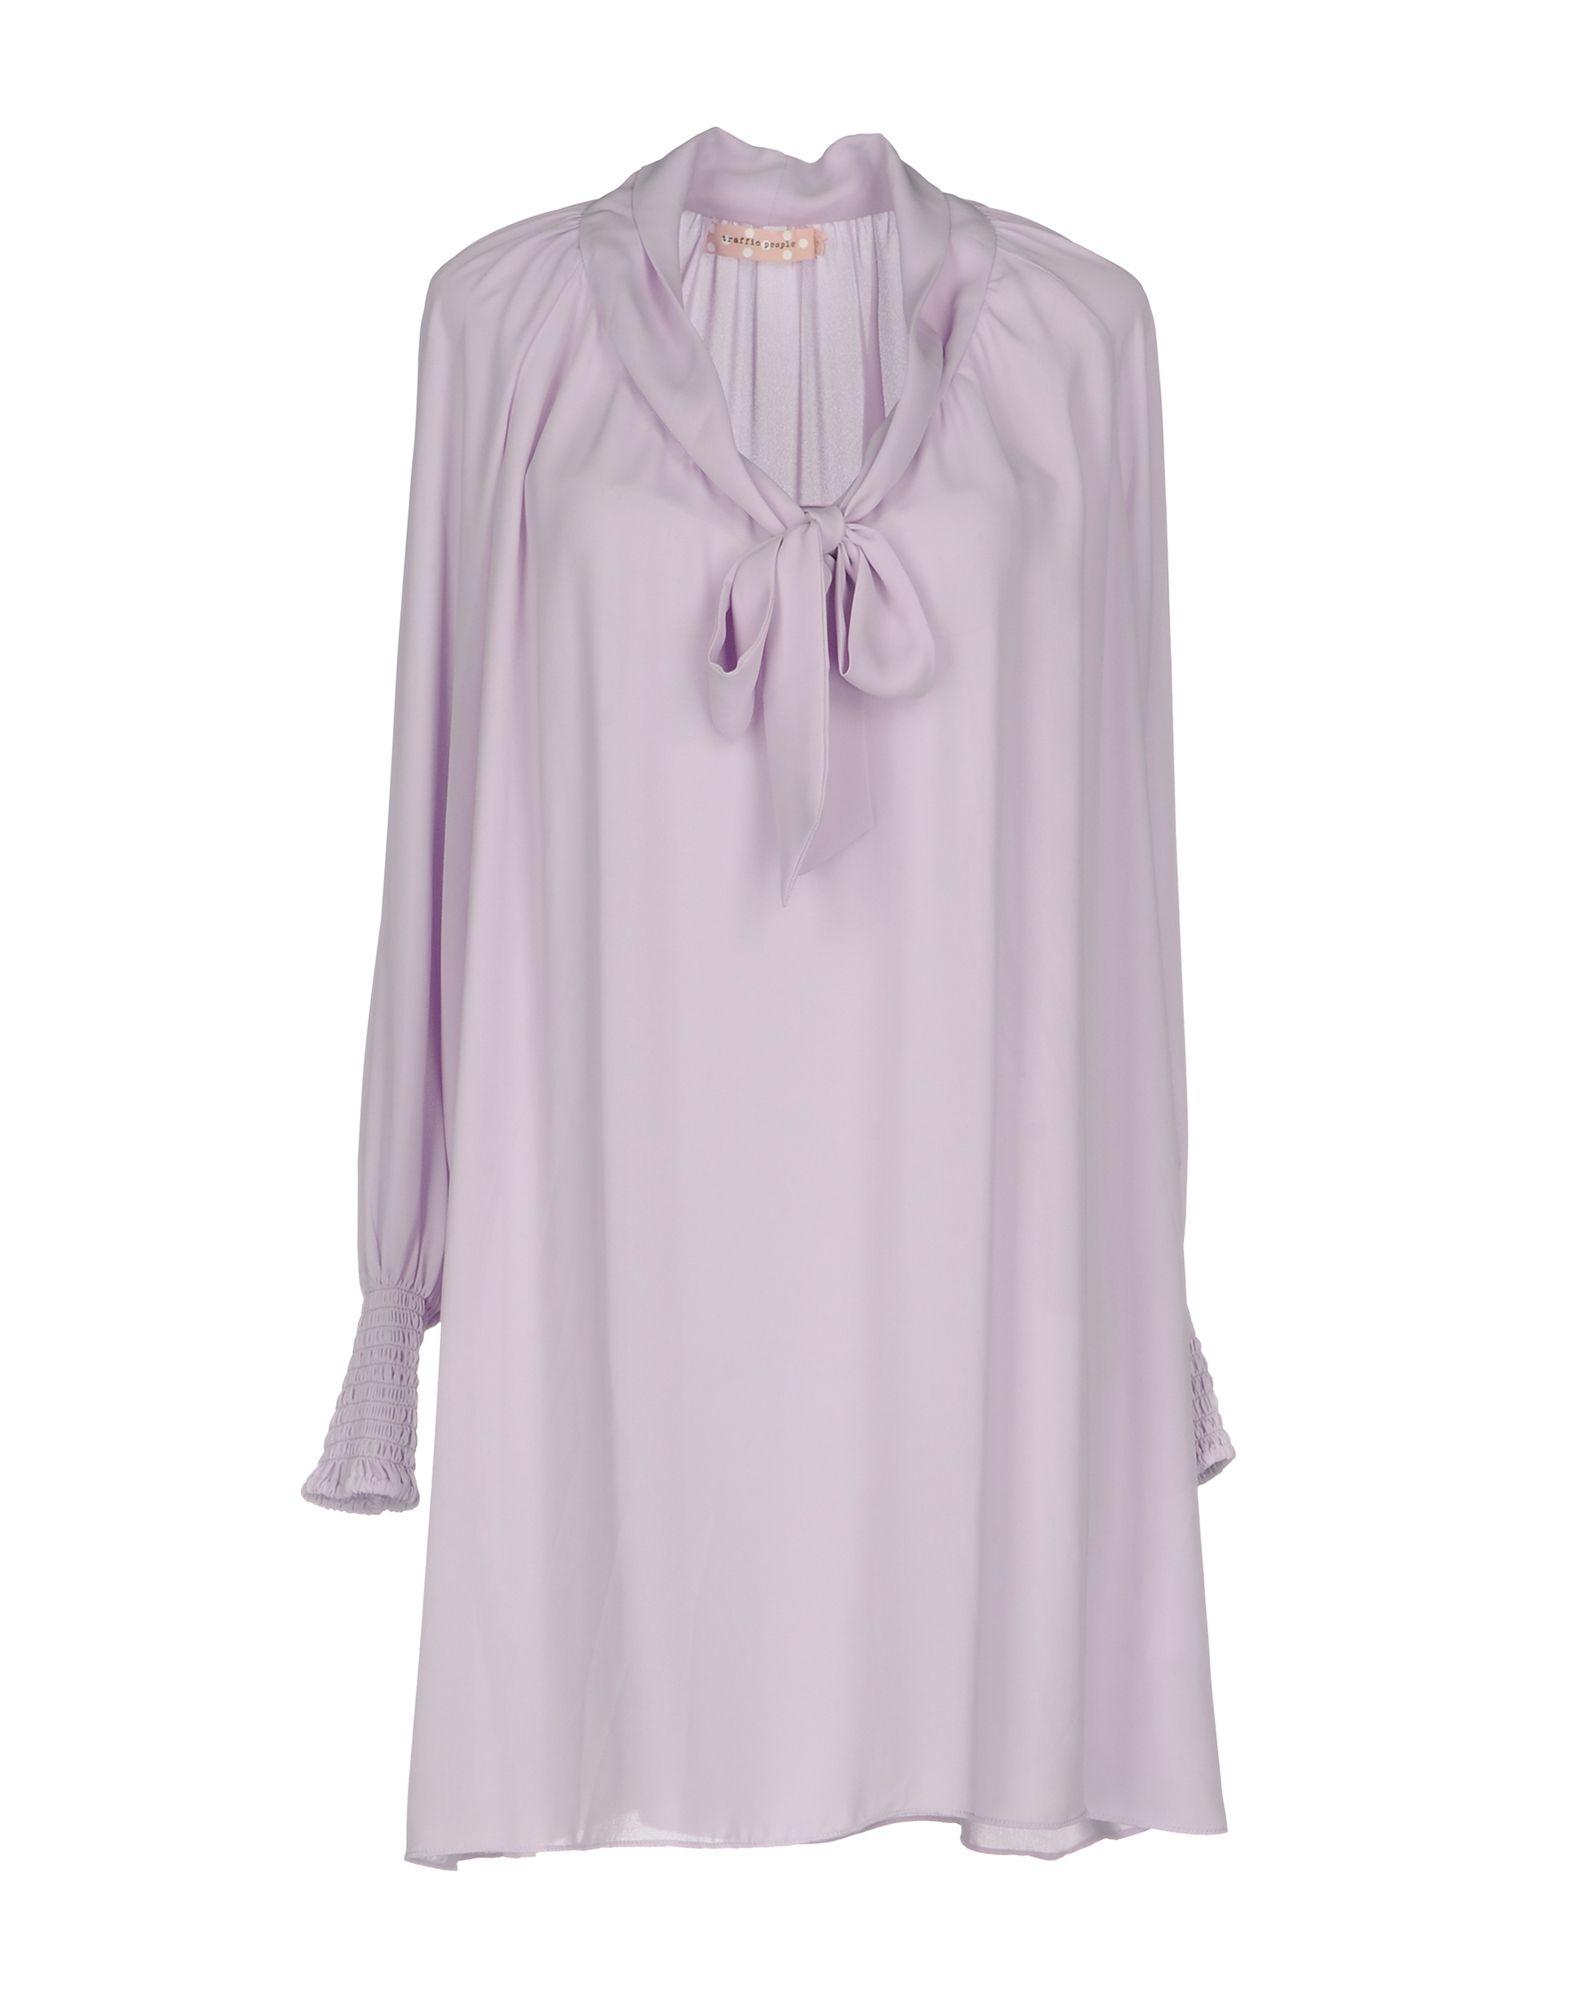 noble people шапка бэби бант для девочки 29515 1081 розовый people TRAFFIC PEOPLE Короткое платье